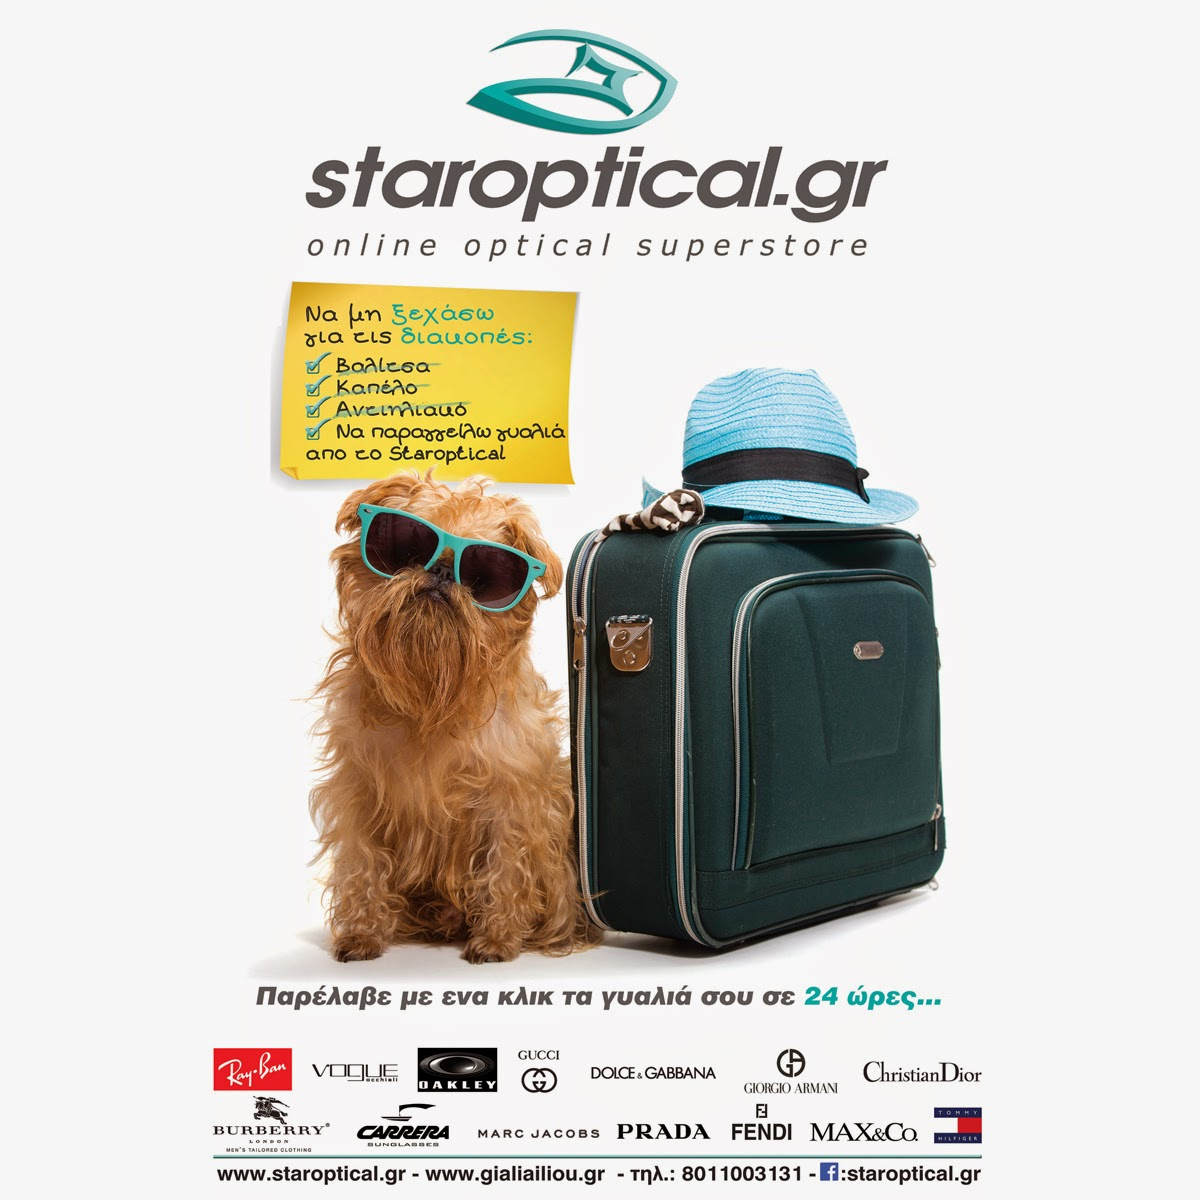 bd8414bdb9 staroptical.gr blog - Γυαλιά Ηλίου - Γυαλιά Οράσεως - Φακοί Επαφής